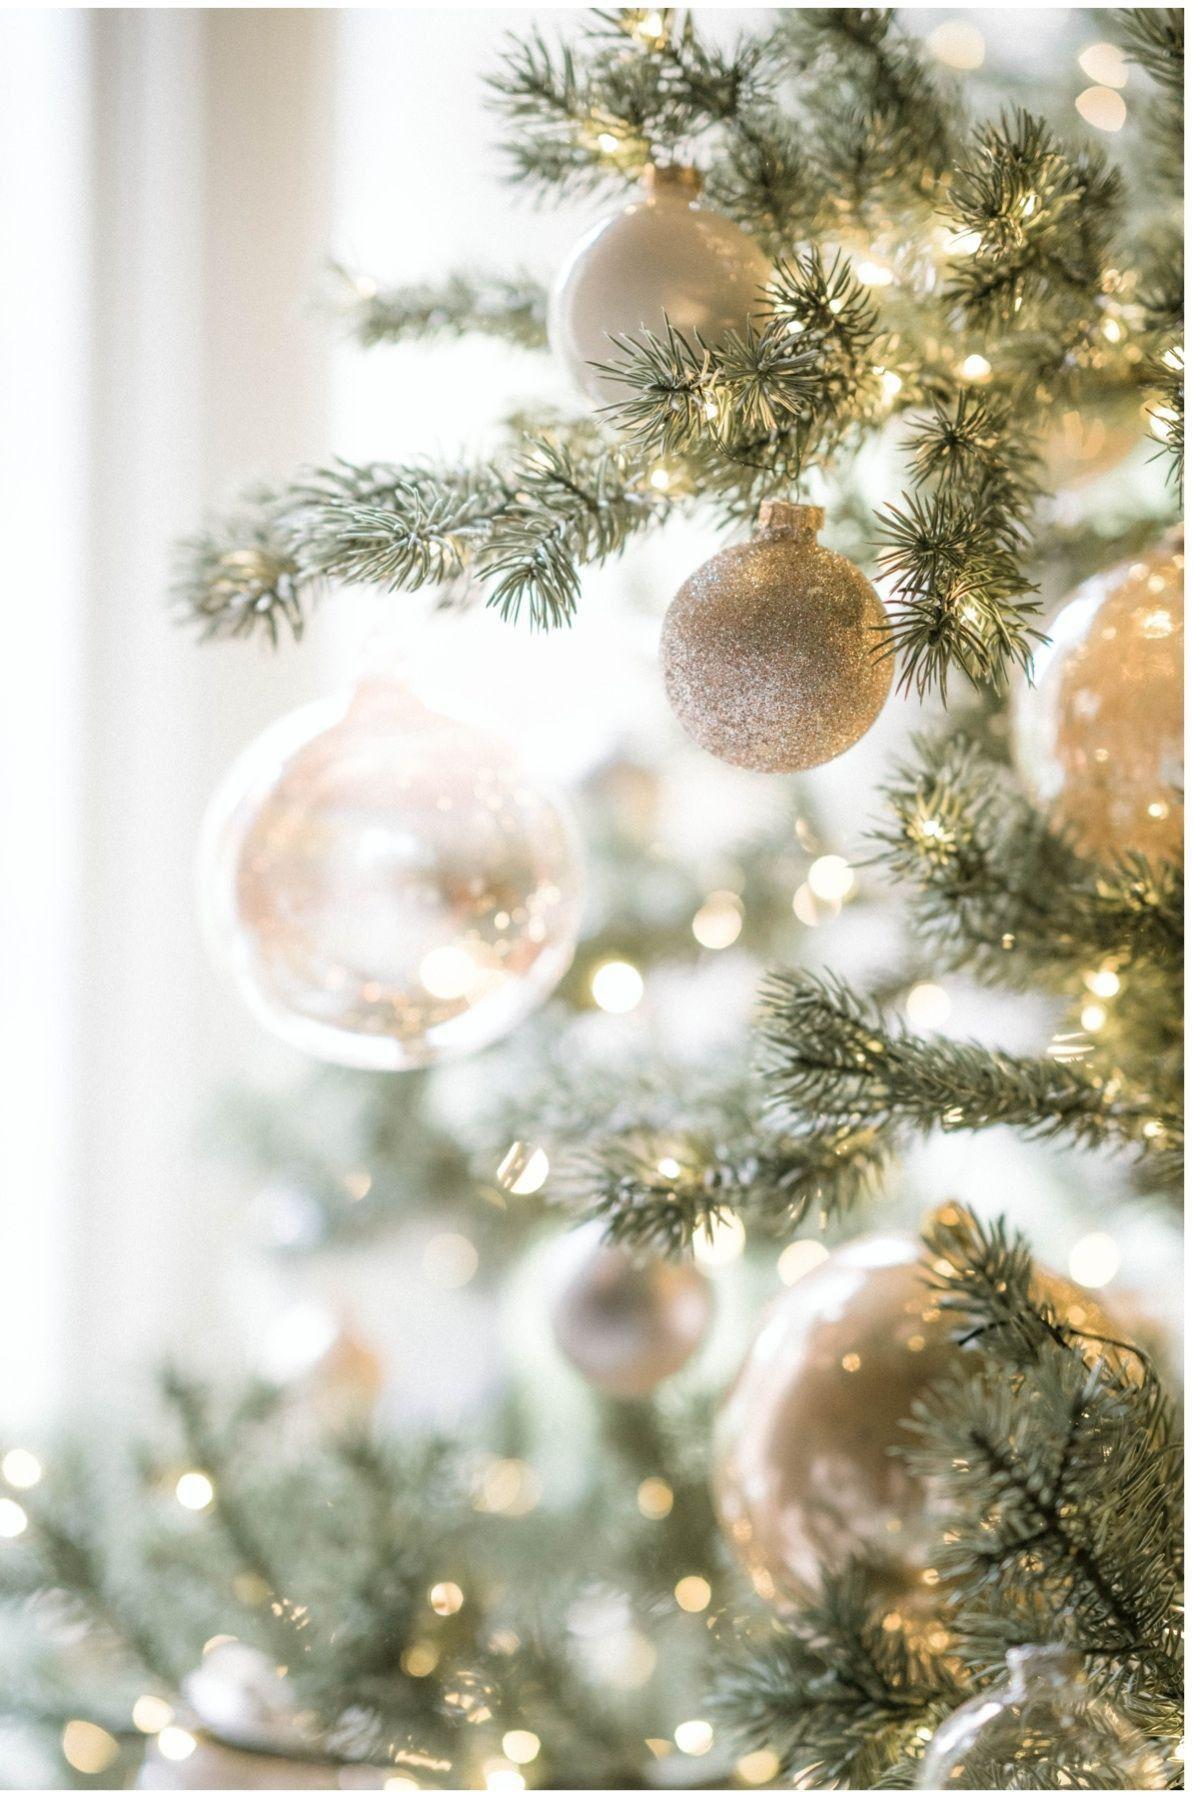 New White Christmas Wallpaper Xmas 65 Ideas Christmas Aesthetic Christmas Time White Christmas